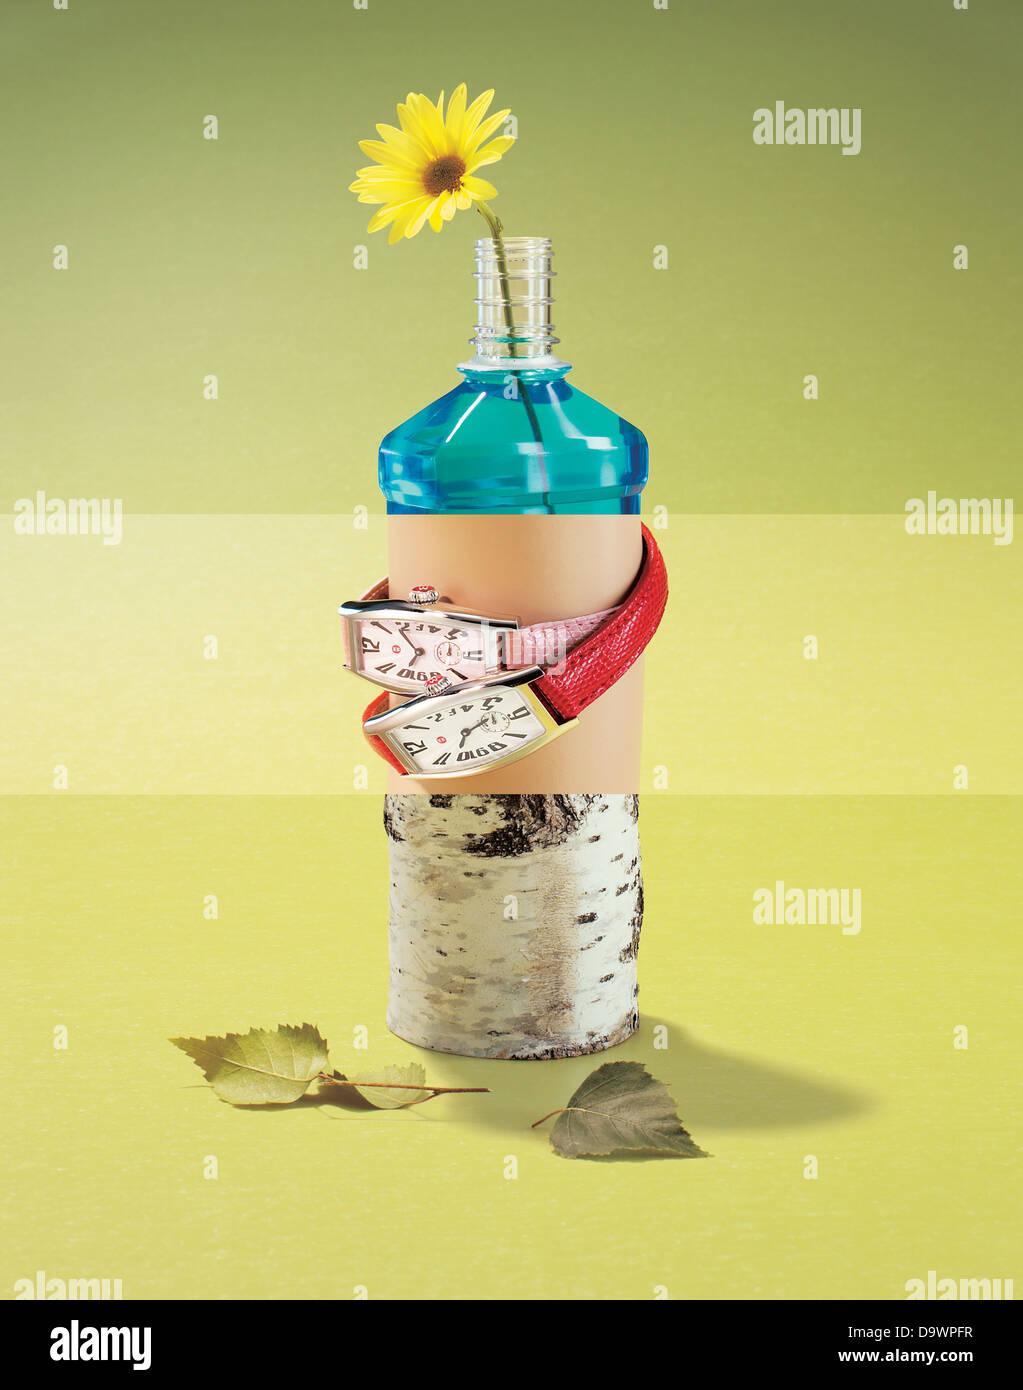 conceptual flower - Stock Image